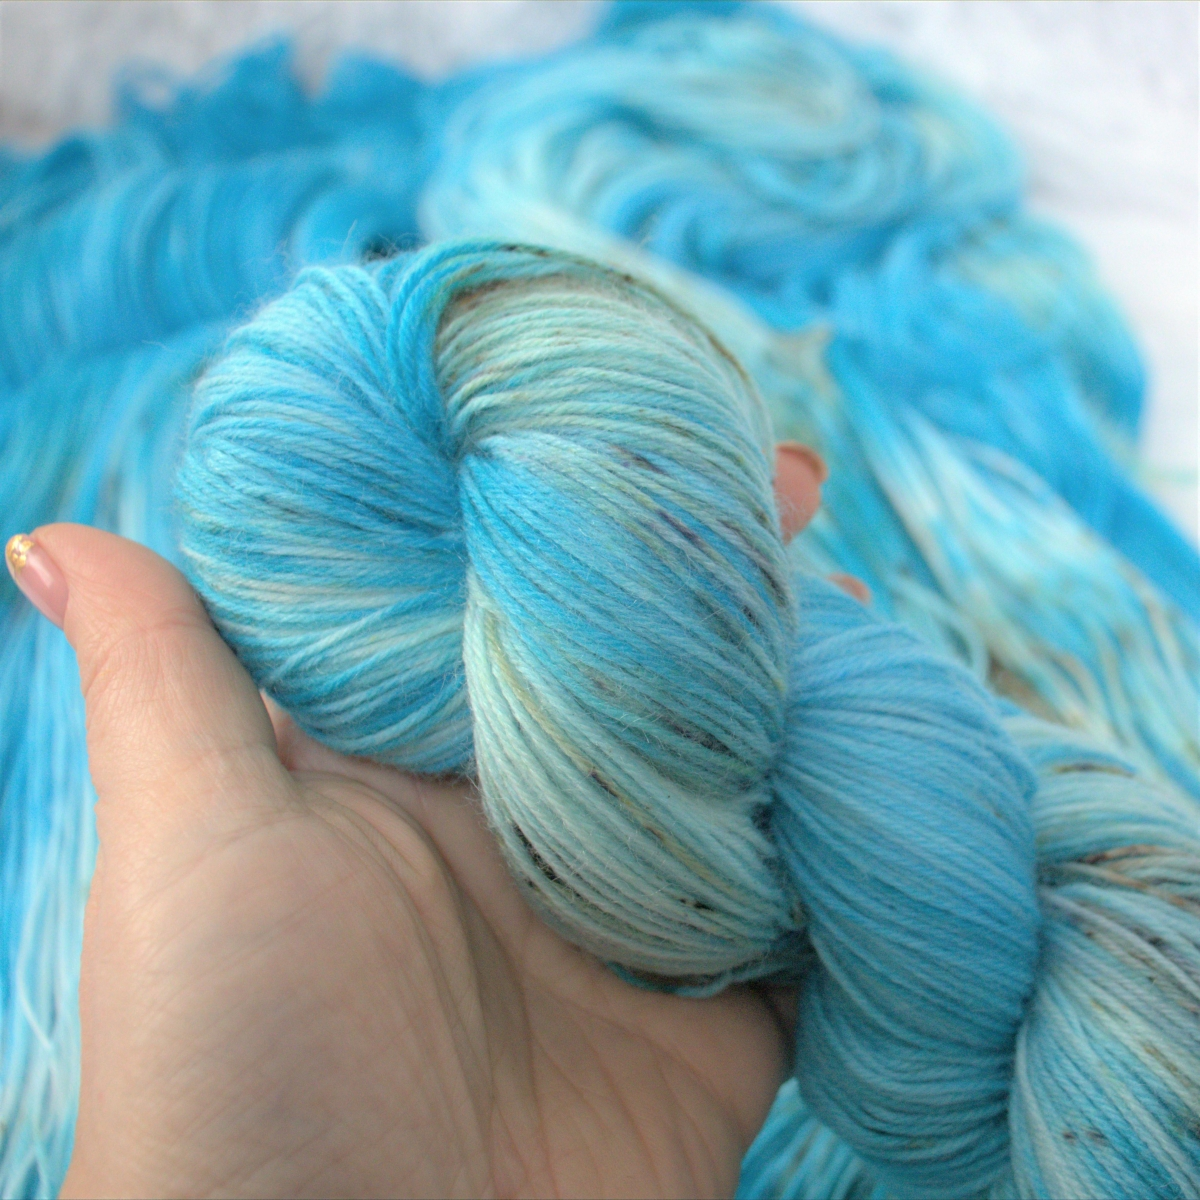 woodico.pro hand dyed yarn 050 1200x1200 - Hand dyed yarn / 050